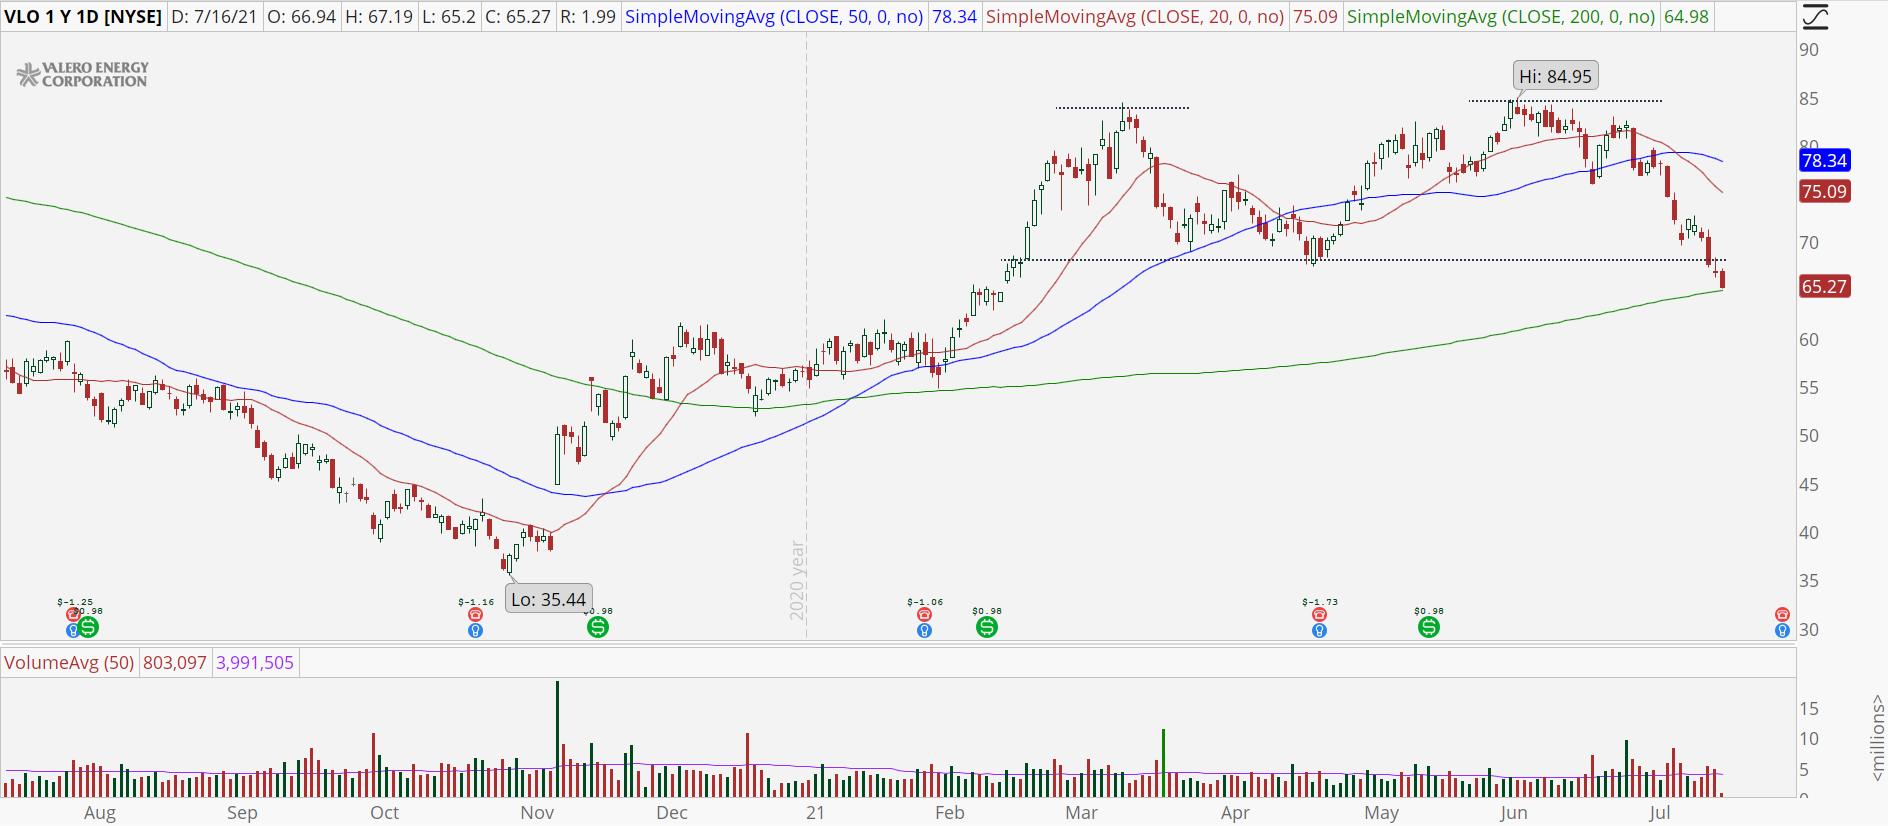 Valero (VLO) stock chart with double top